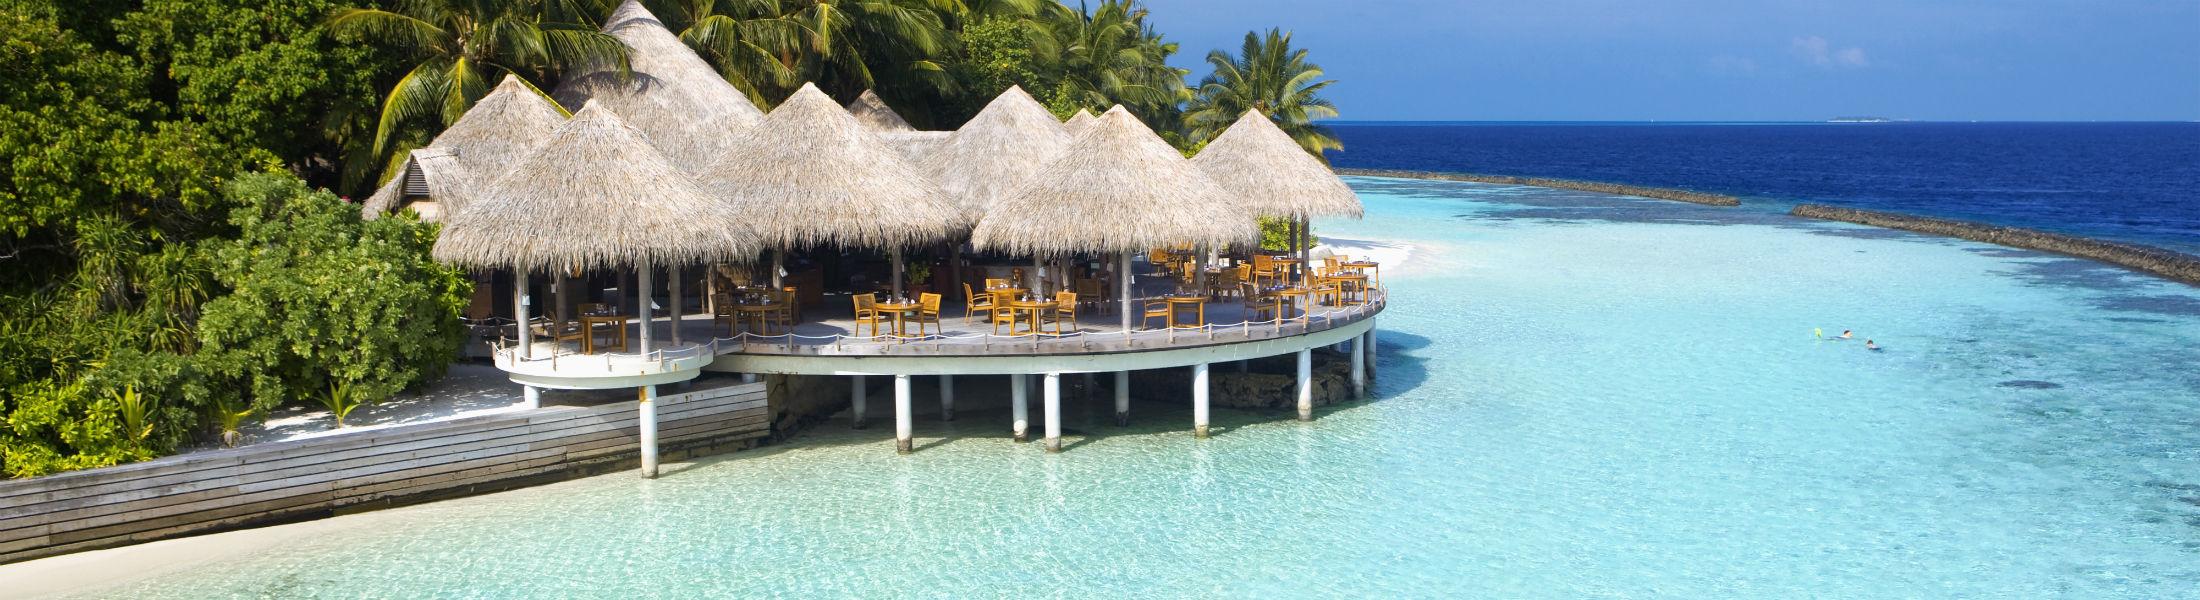 Cayenne restaurant at the Baros Maldives